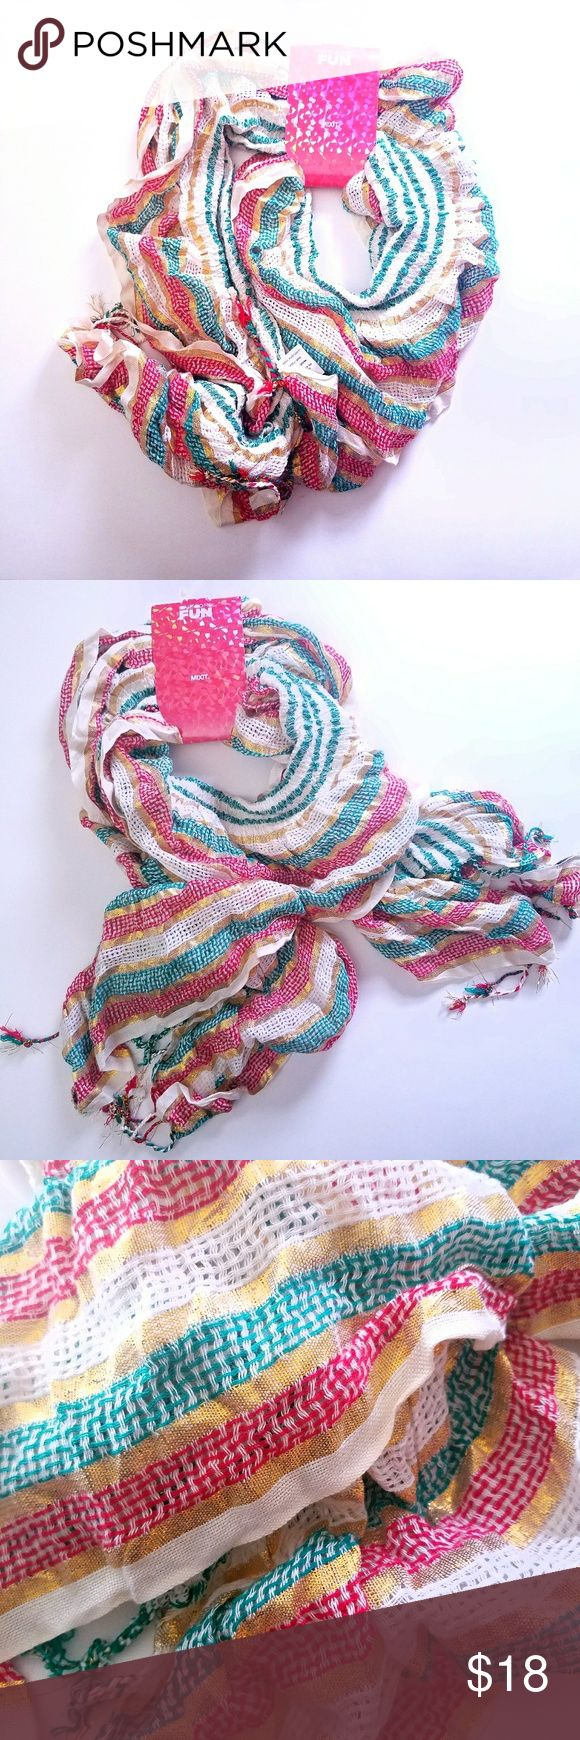 NWT multicolored metalic striped tassle scarf Brand new  Orginal price $32.00 Gorgeous metallic gold stripe Mixit Accessories Scarves & Wraps